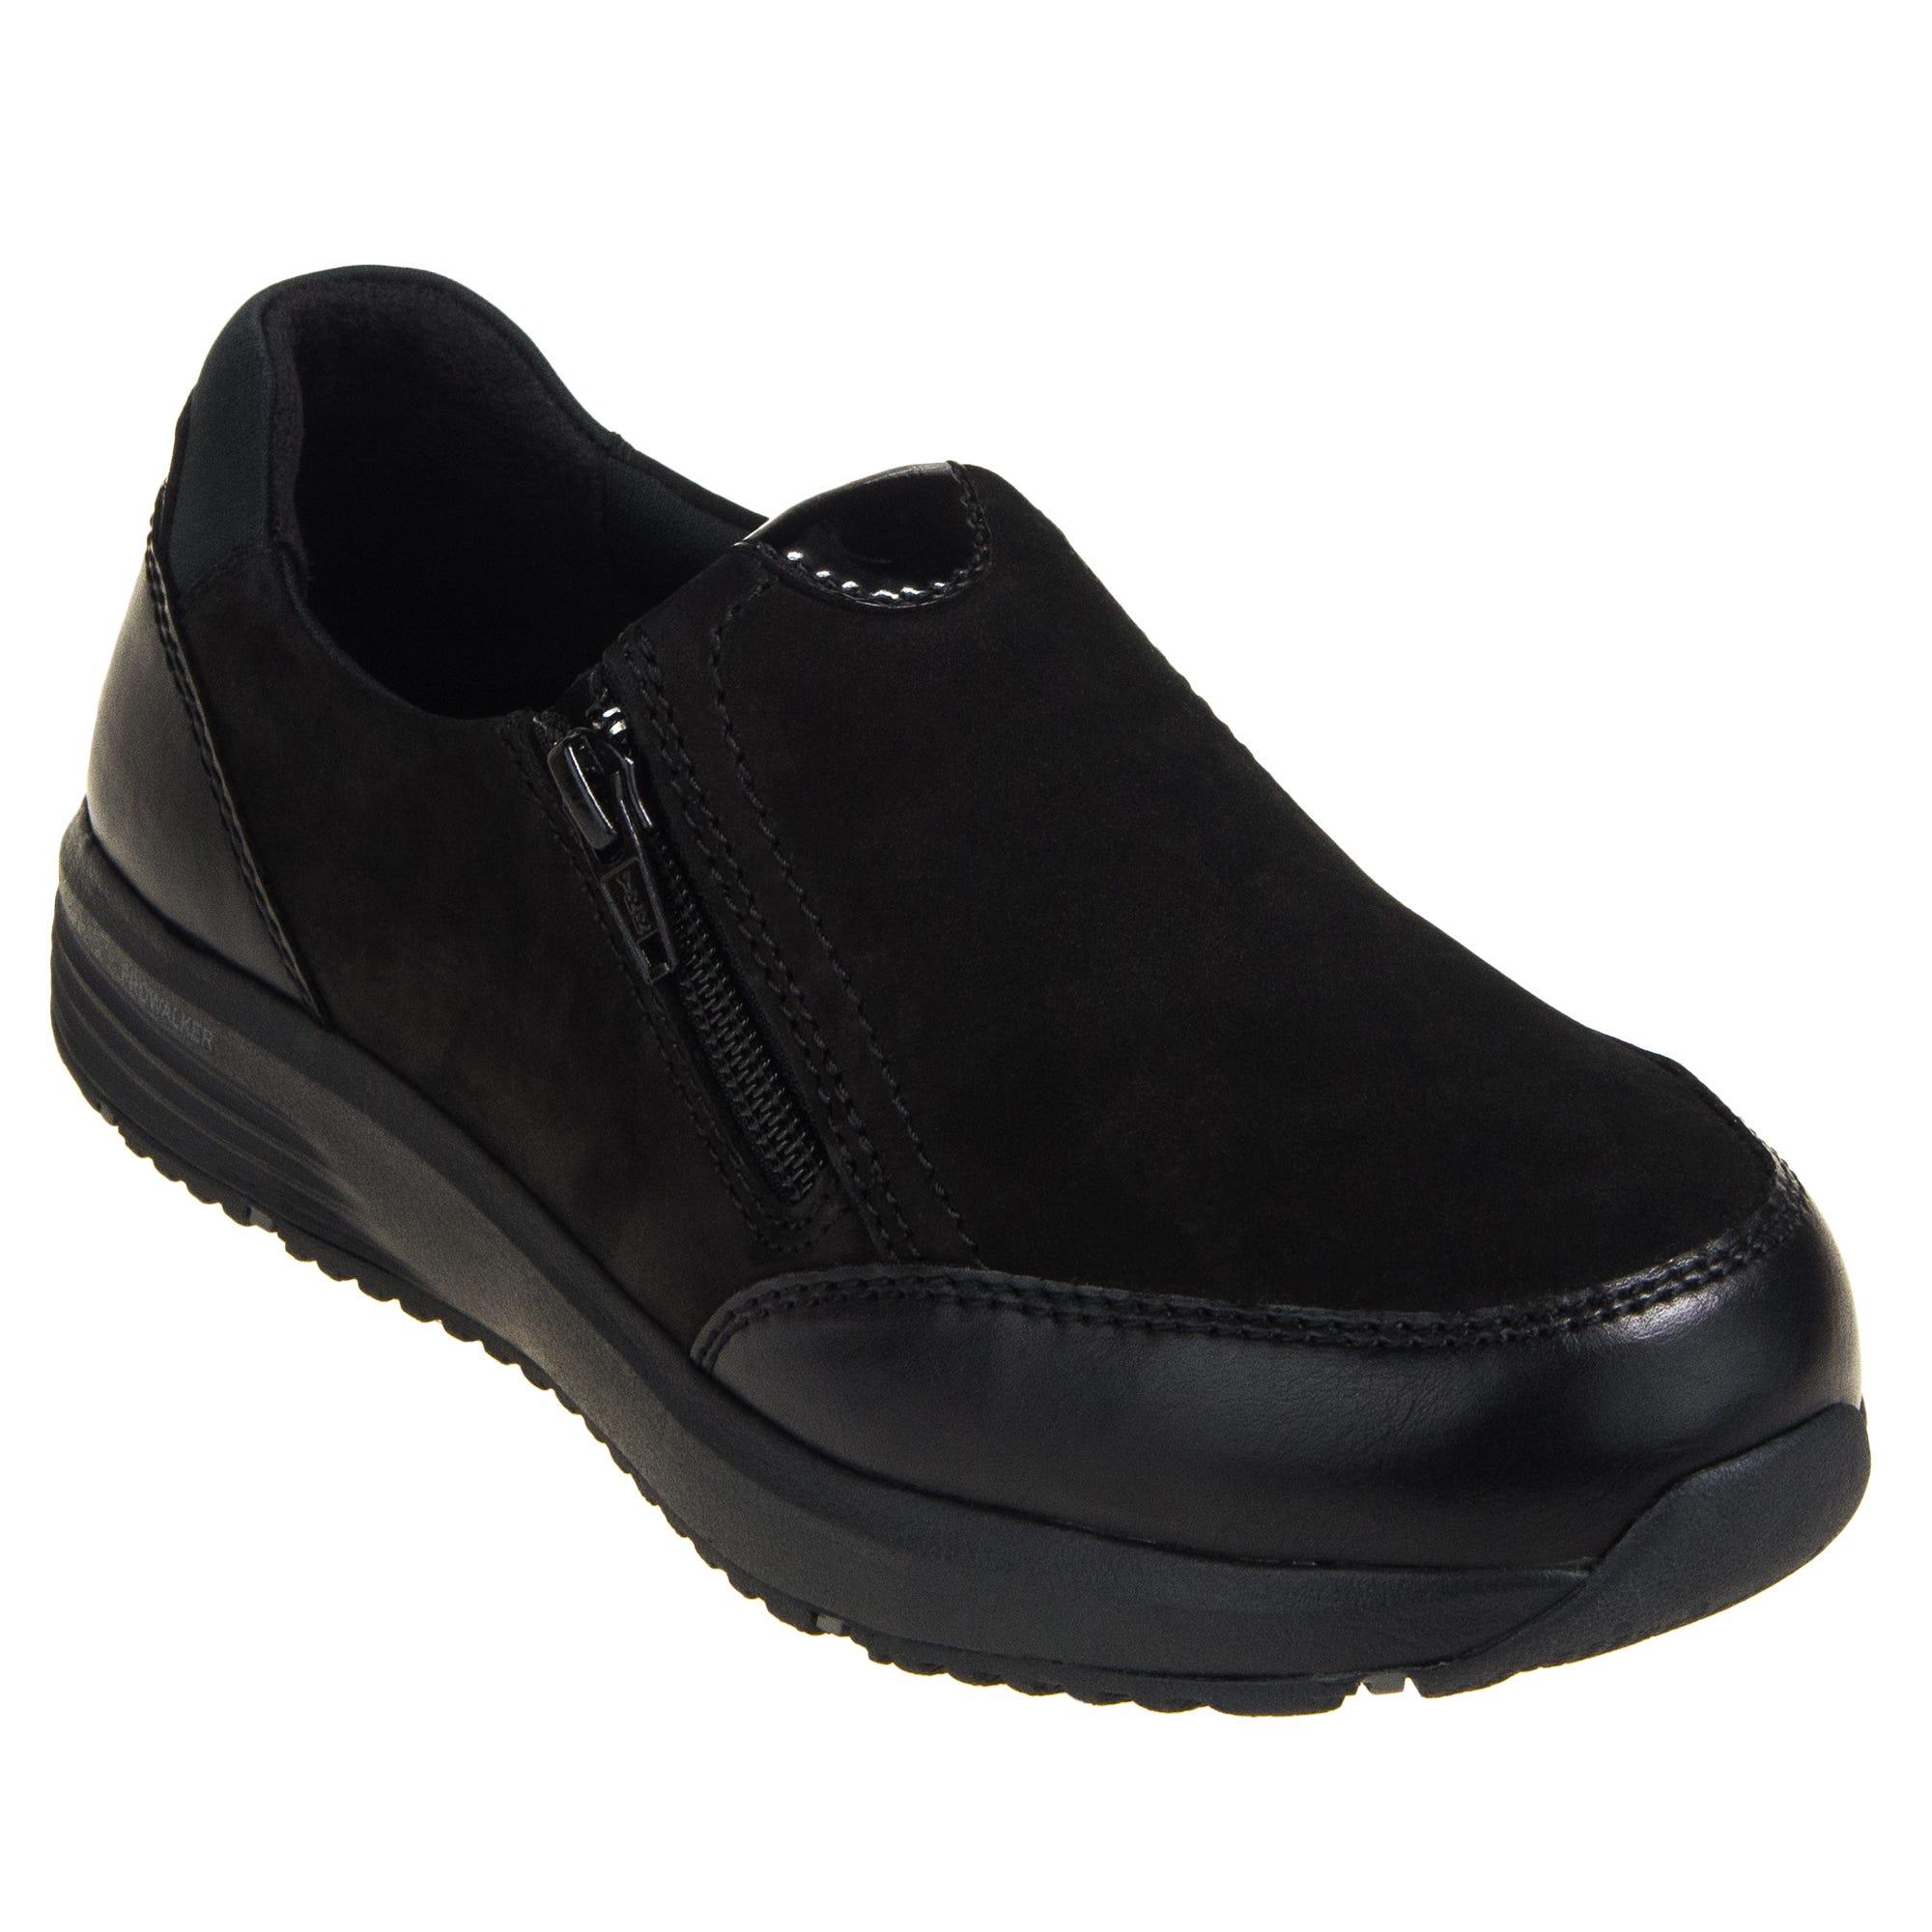 Rockport Trustride RK500 Women's Black Slip On EH Steel Toe Zip Work Shoes